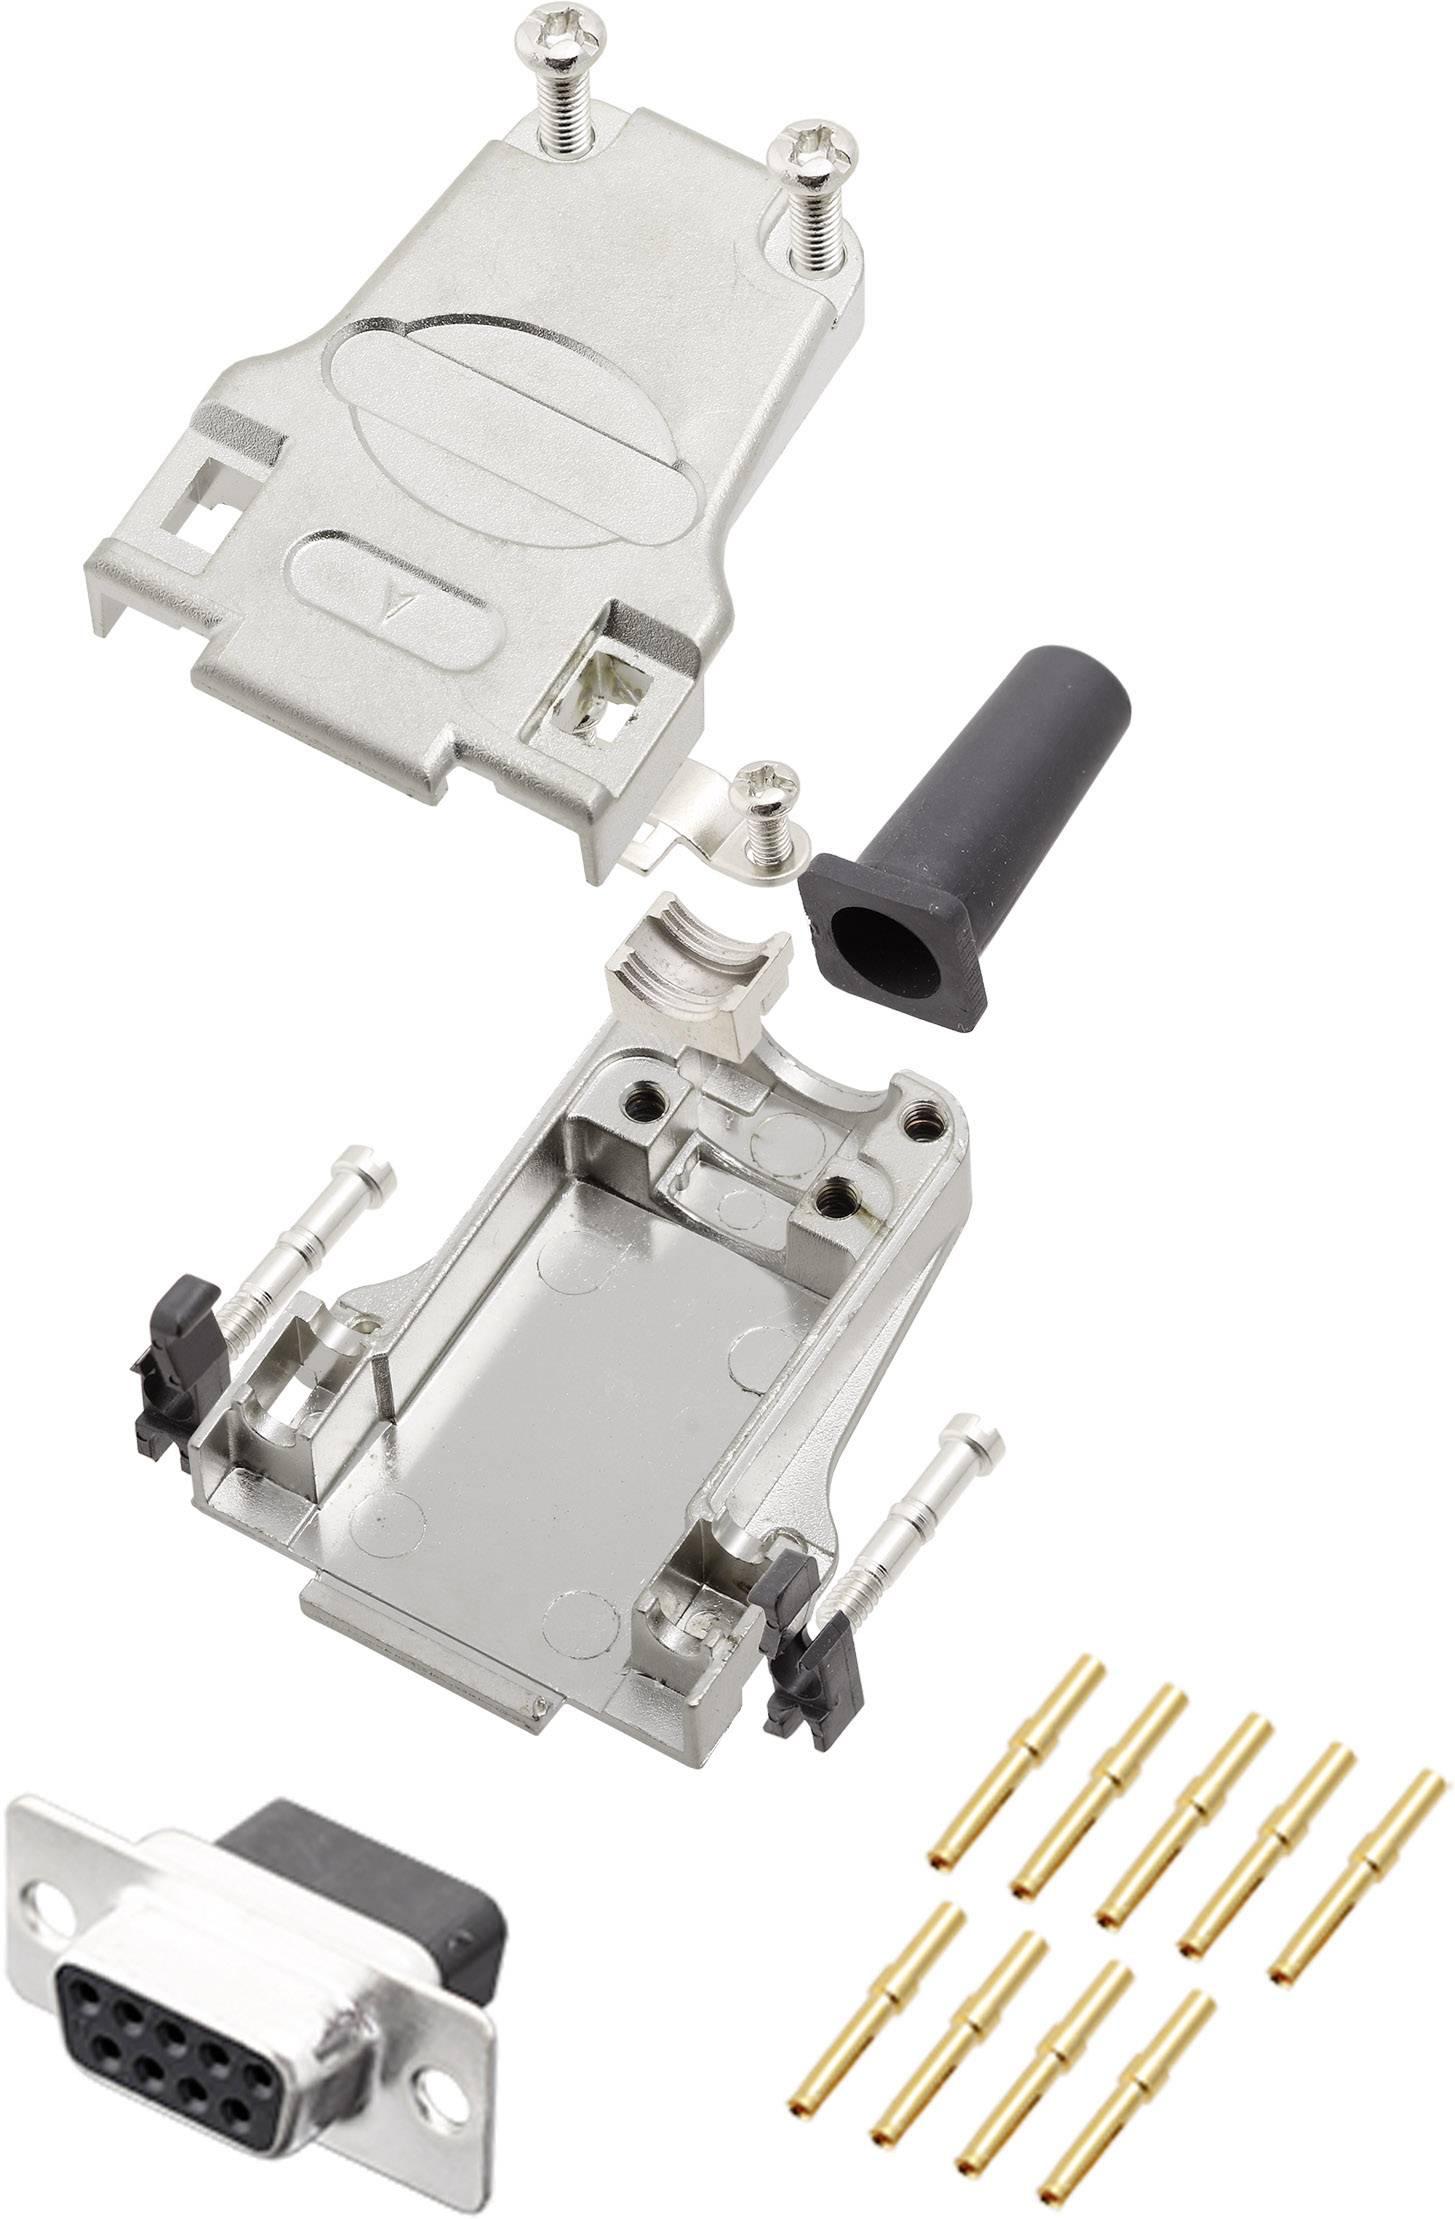 Sada D-SUB zásuvková lišta encitech DTZF09-DBCS-K, 180 °, pólů 9, krimpované připojení, 1 ks